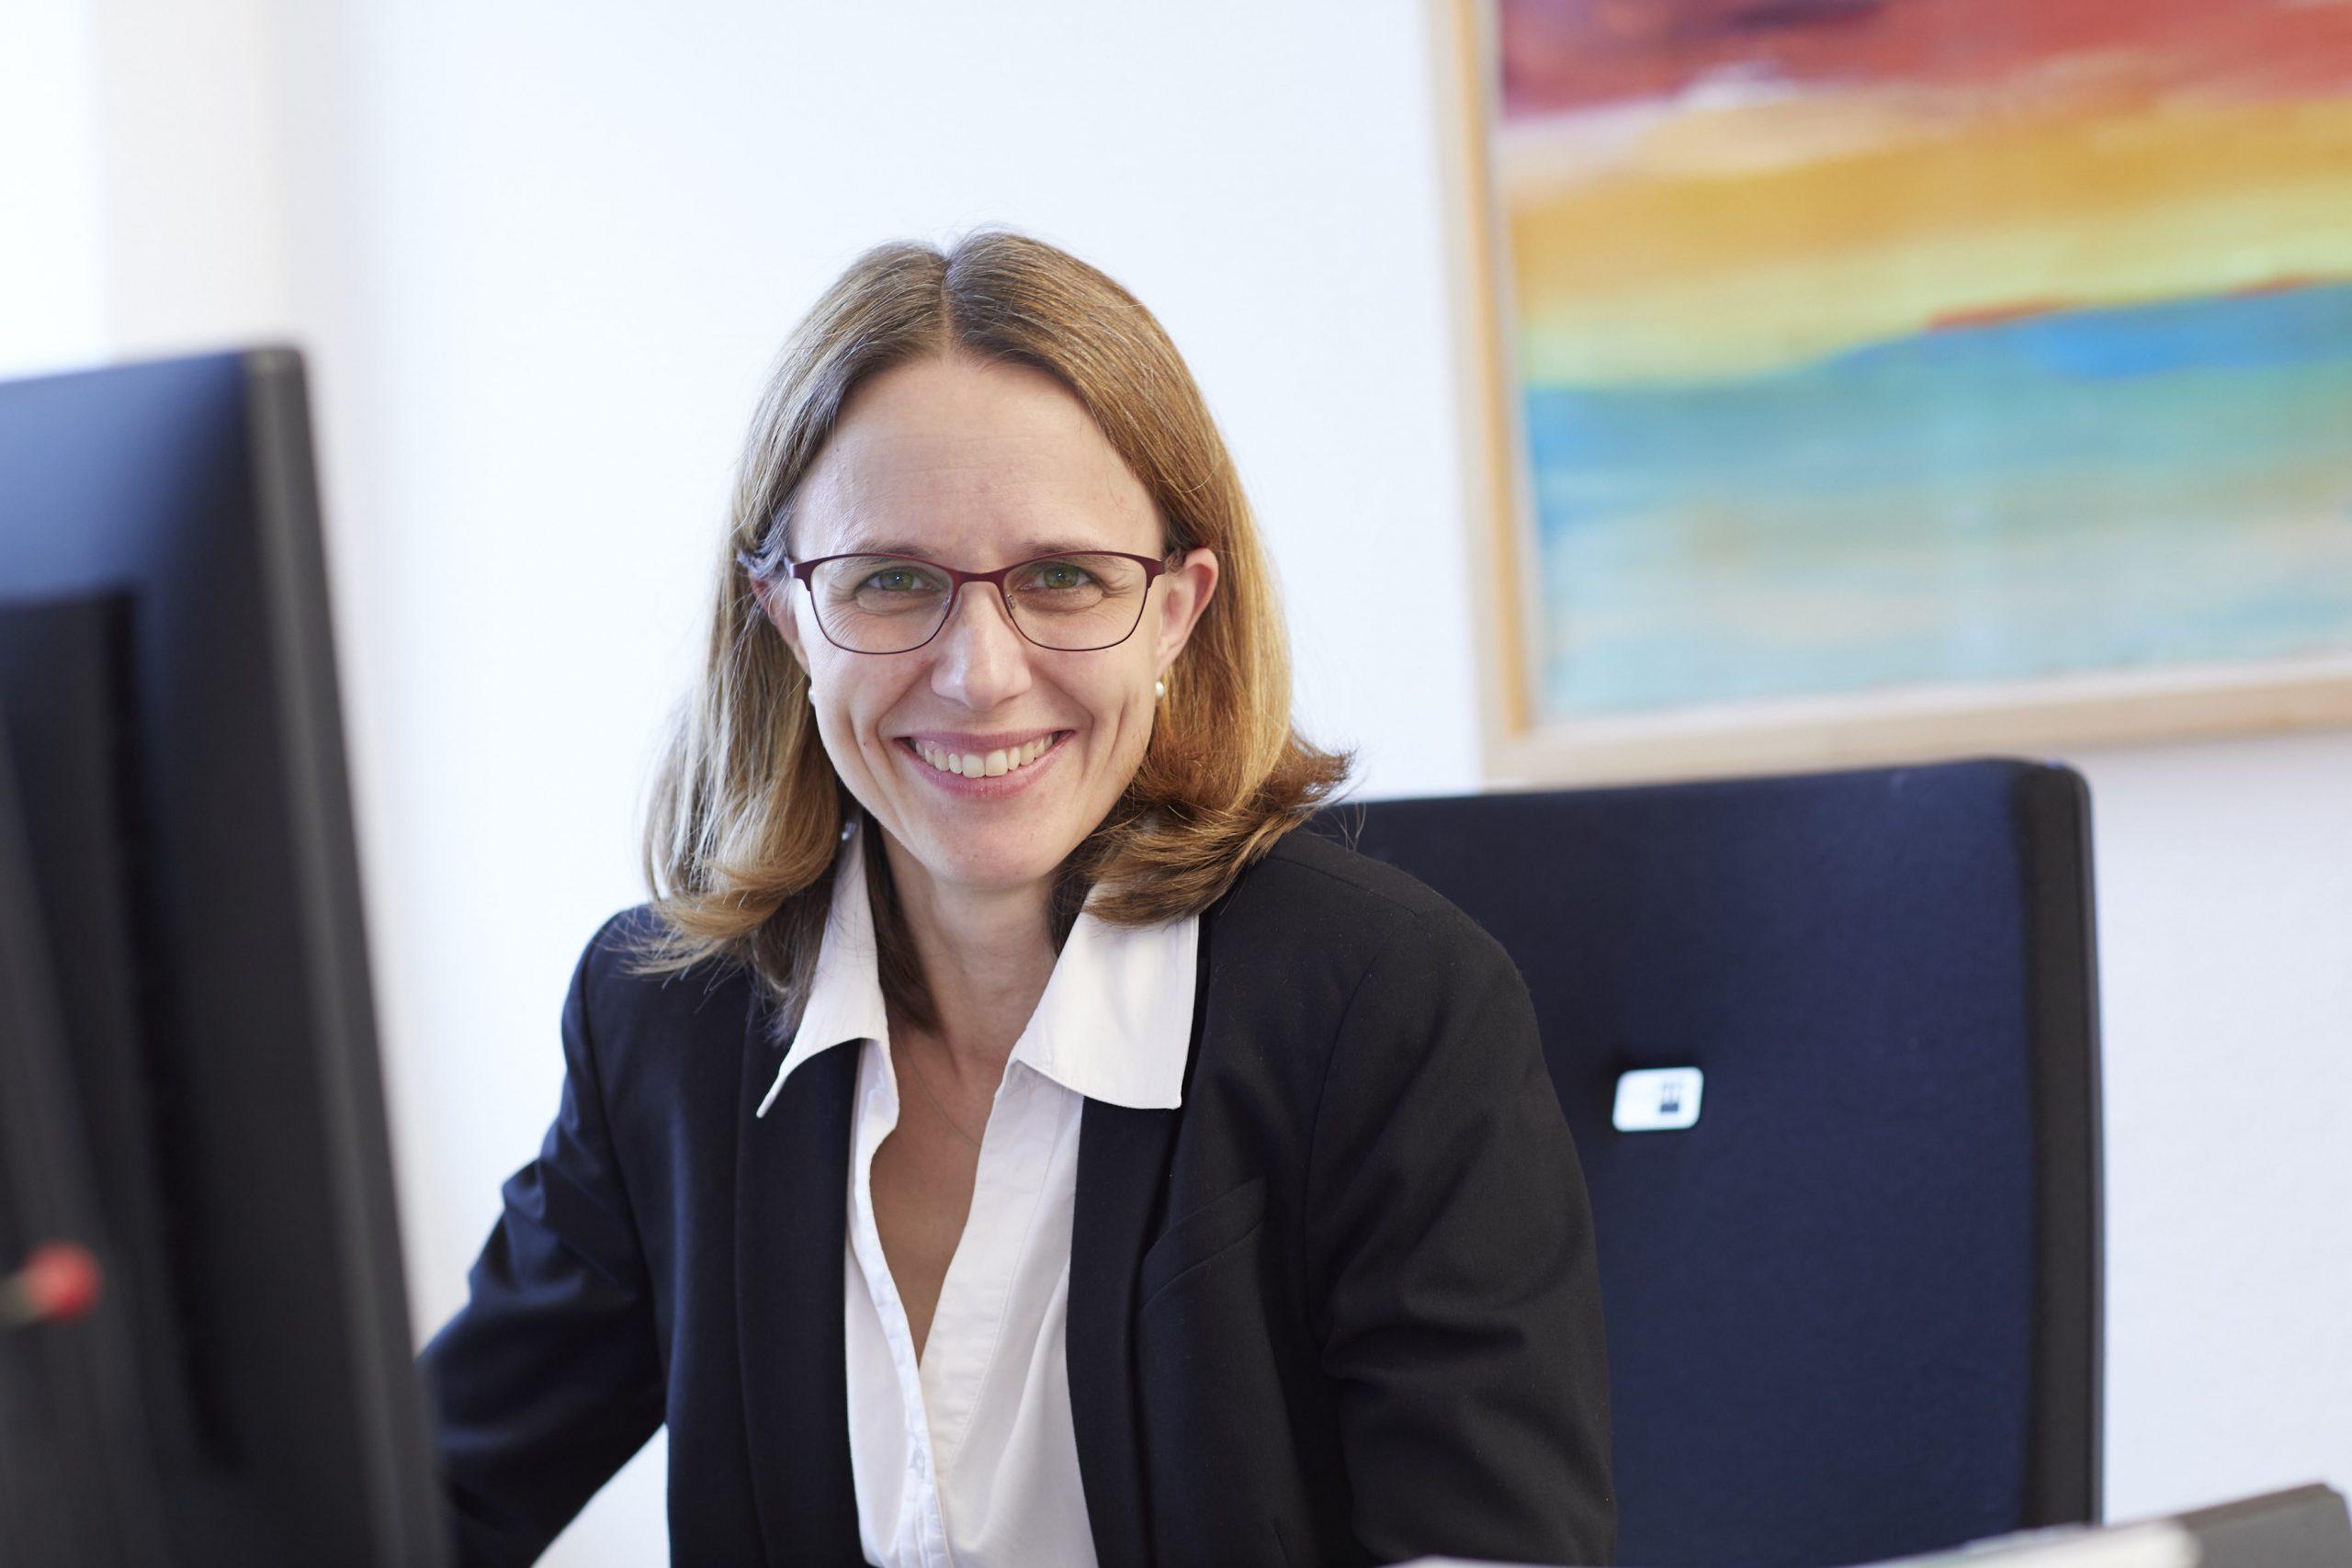 Daniela Lorkowski- Steuerberater Eggeling und Partner in Düsseldorf